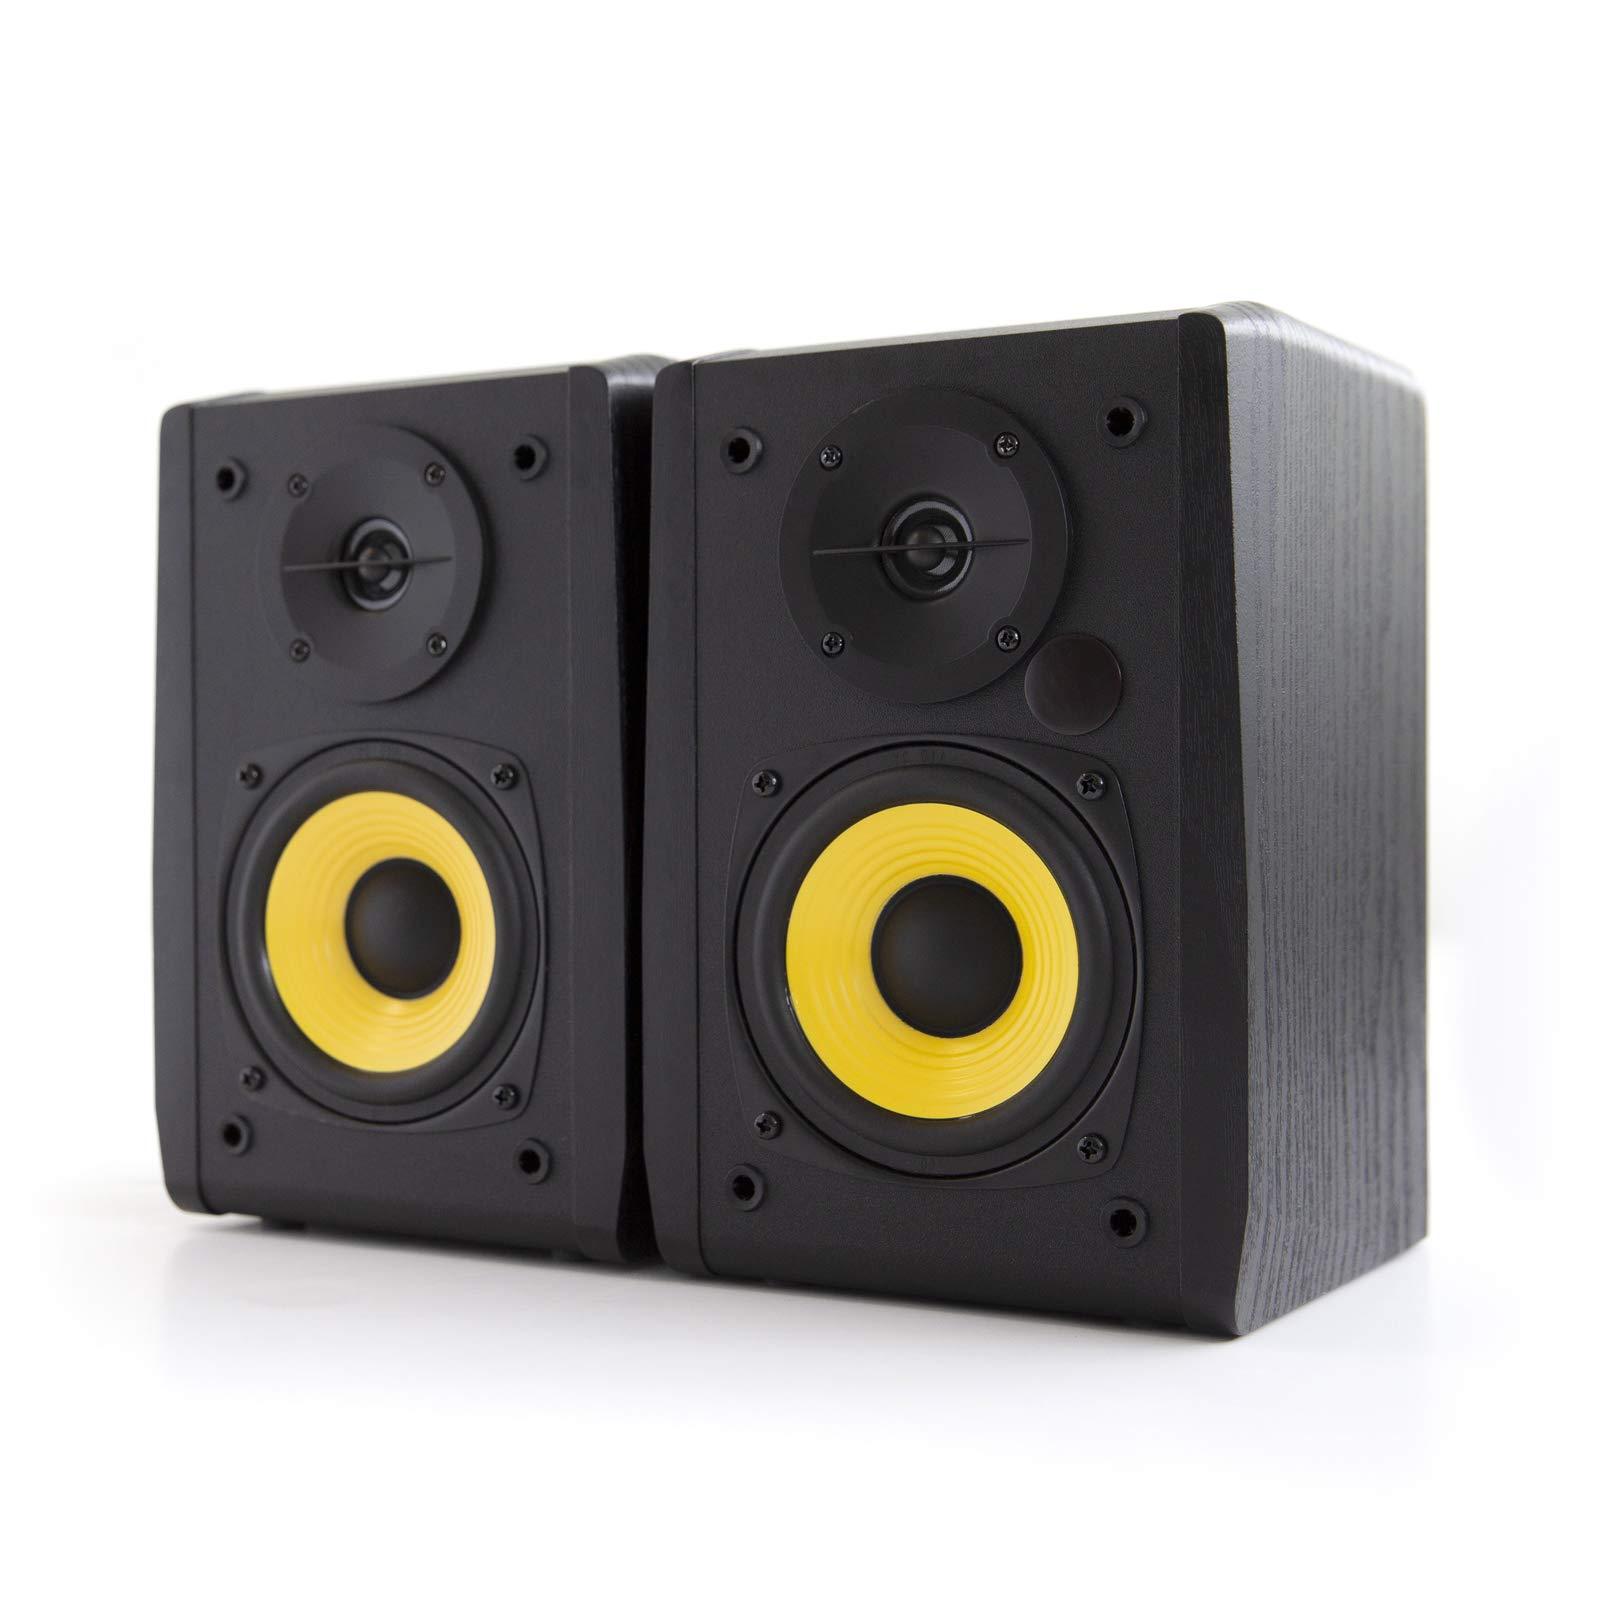 Edifier R1010BT 4'' Active Bluetooth Bookshelf Speakers - 2.0 Computer Speaker - Powered Studio Monitor (Pair) by Edifier